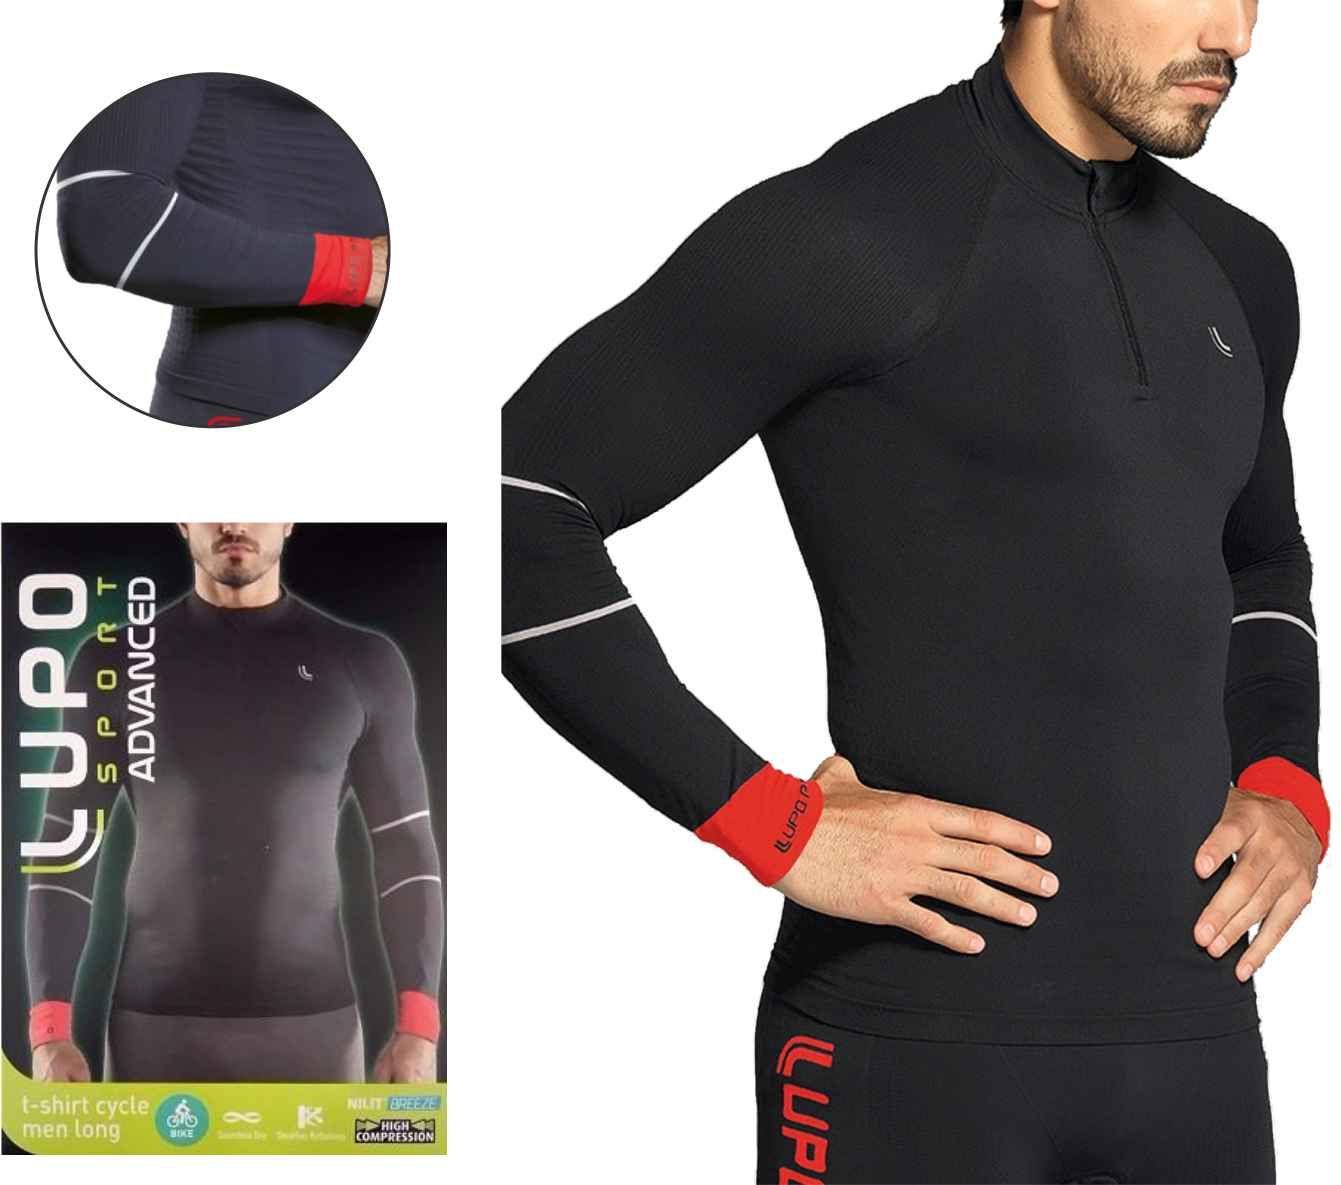 Camiseta Compressão Ciclismo T-shirt Cycle Men Long Lupo 70652-001